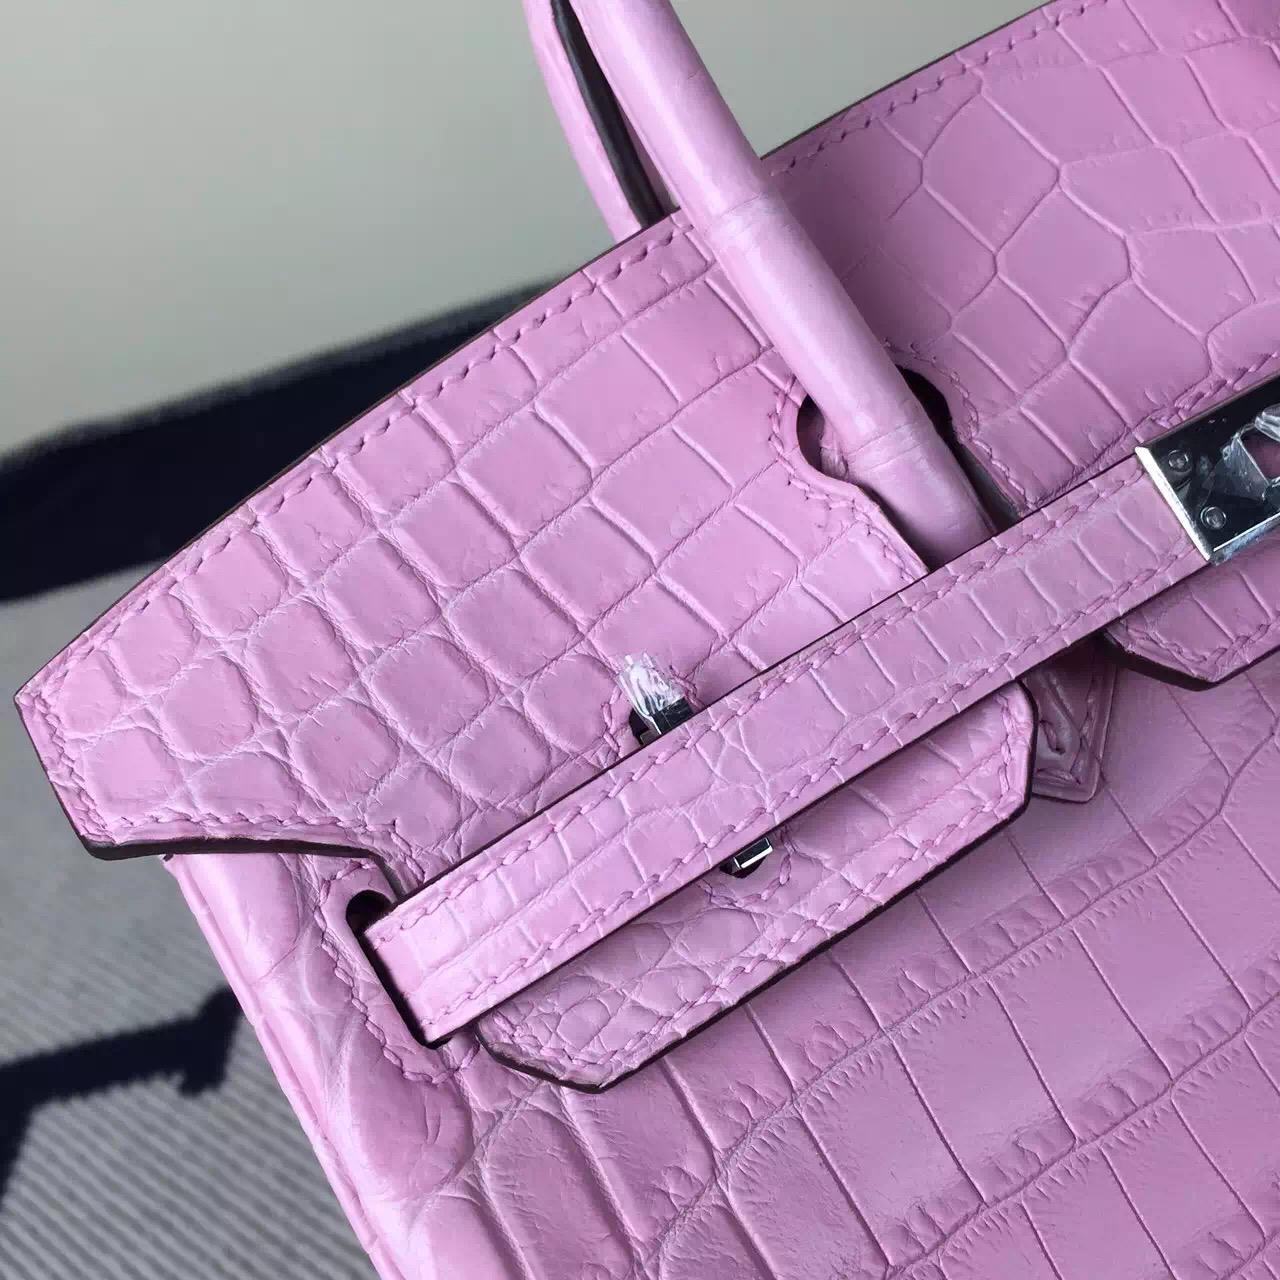 New Pretty Hermes Light Pink Crocodile Matt Leather Birkin Bag 25cm